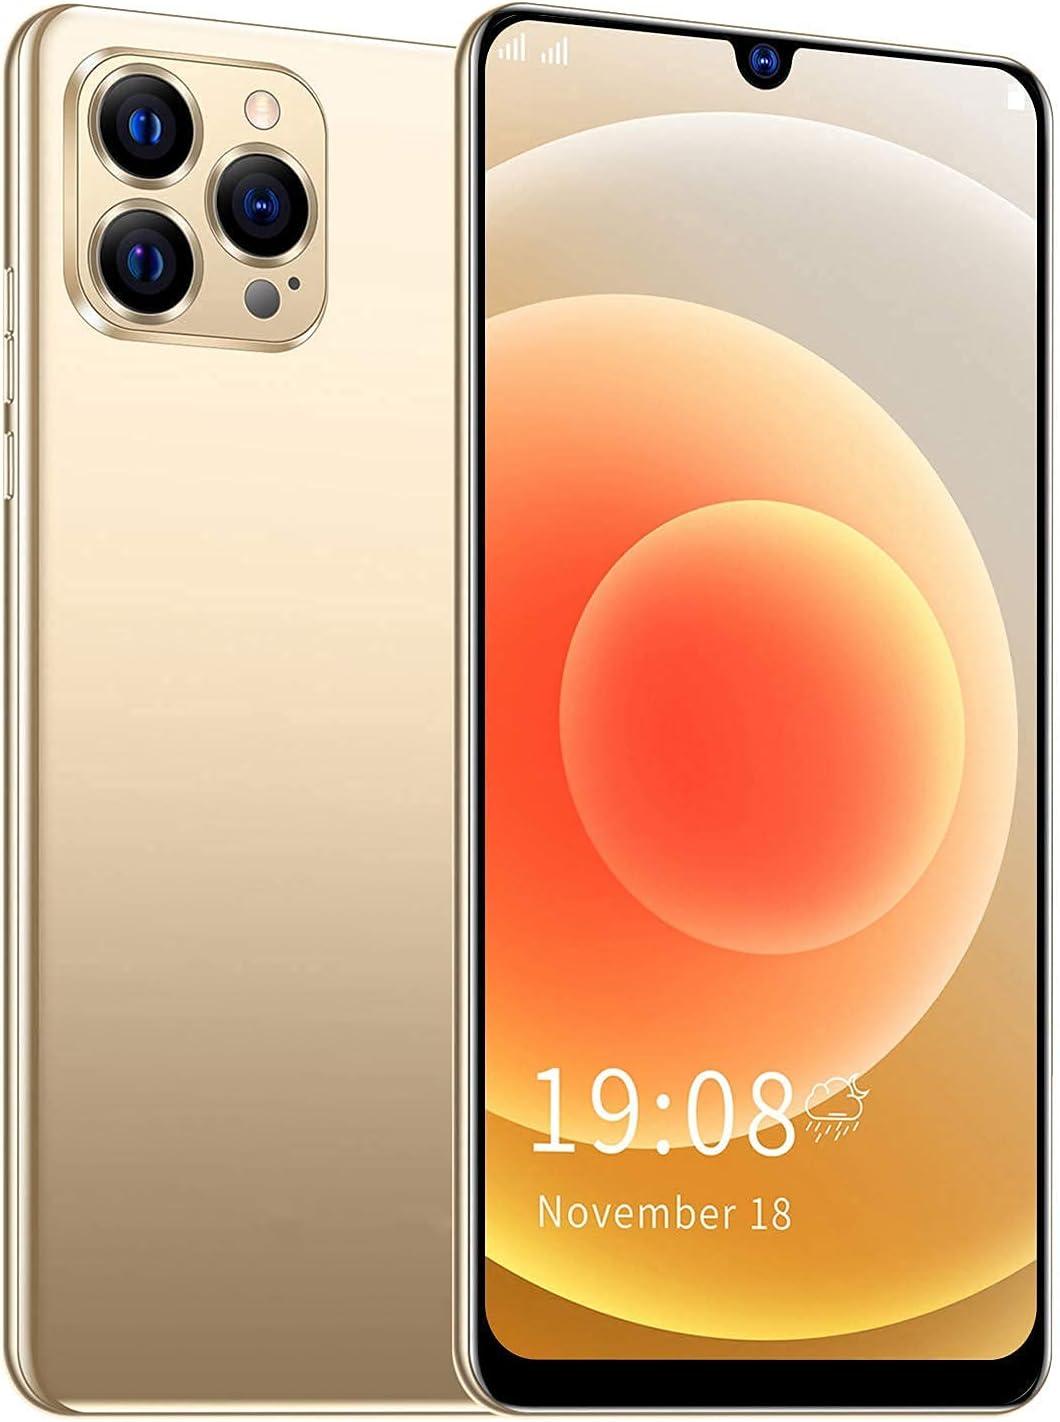 Vbestlife IP12 PRO+ Unlocked Android Smartphone,6.26